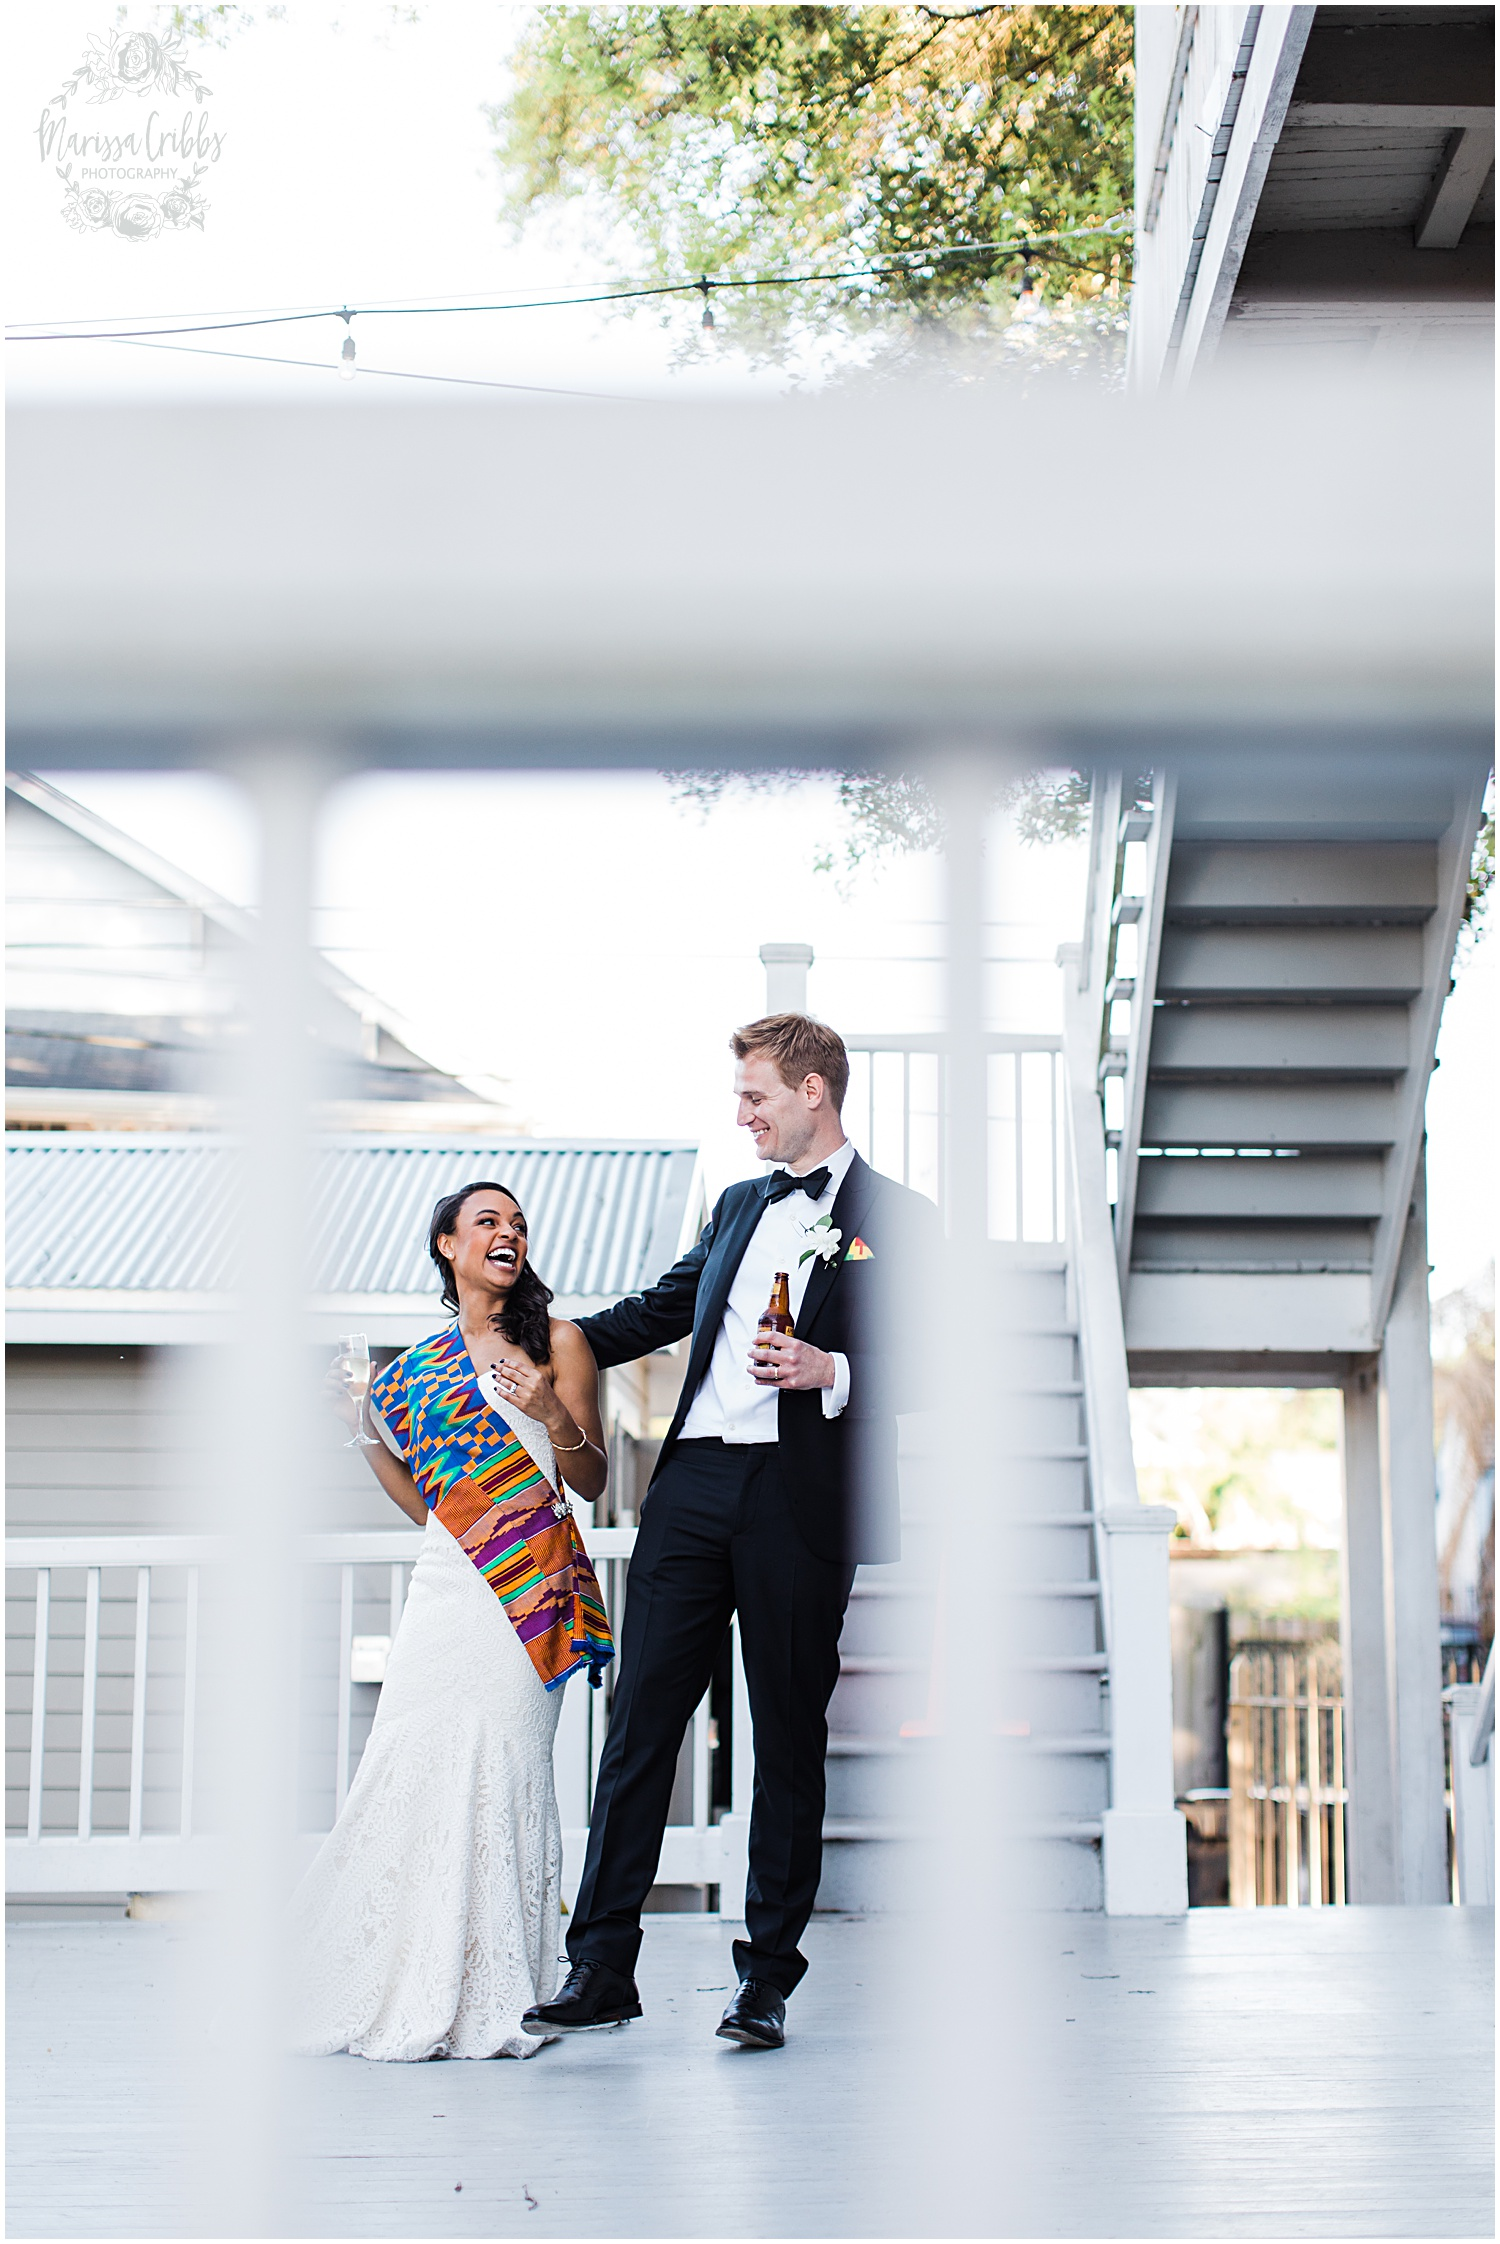 NEW ORLEANS WEDDING   BENACHI HOUSE   SARAH & MICHAEL   MARISSA CRIBBS PHOTOGRAPHY_4475.jpg